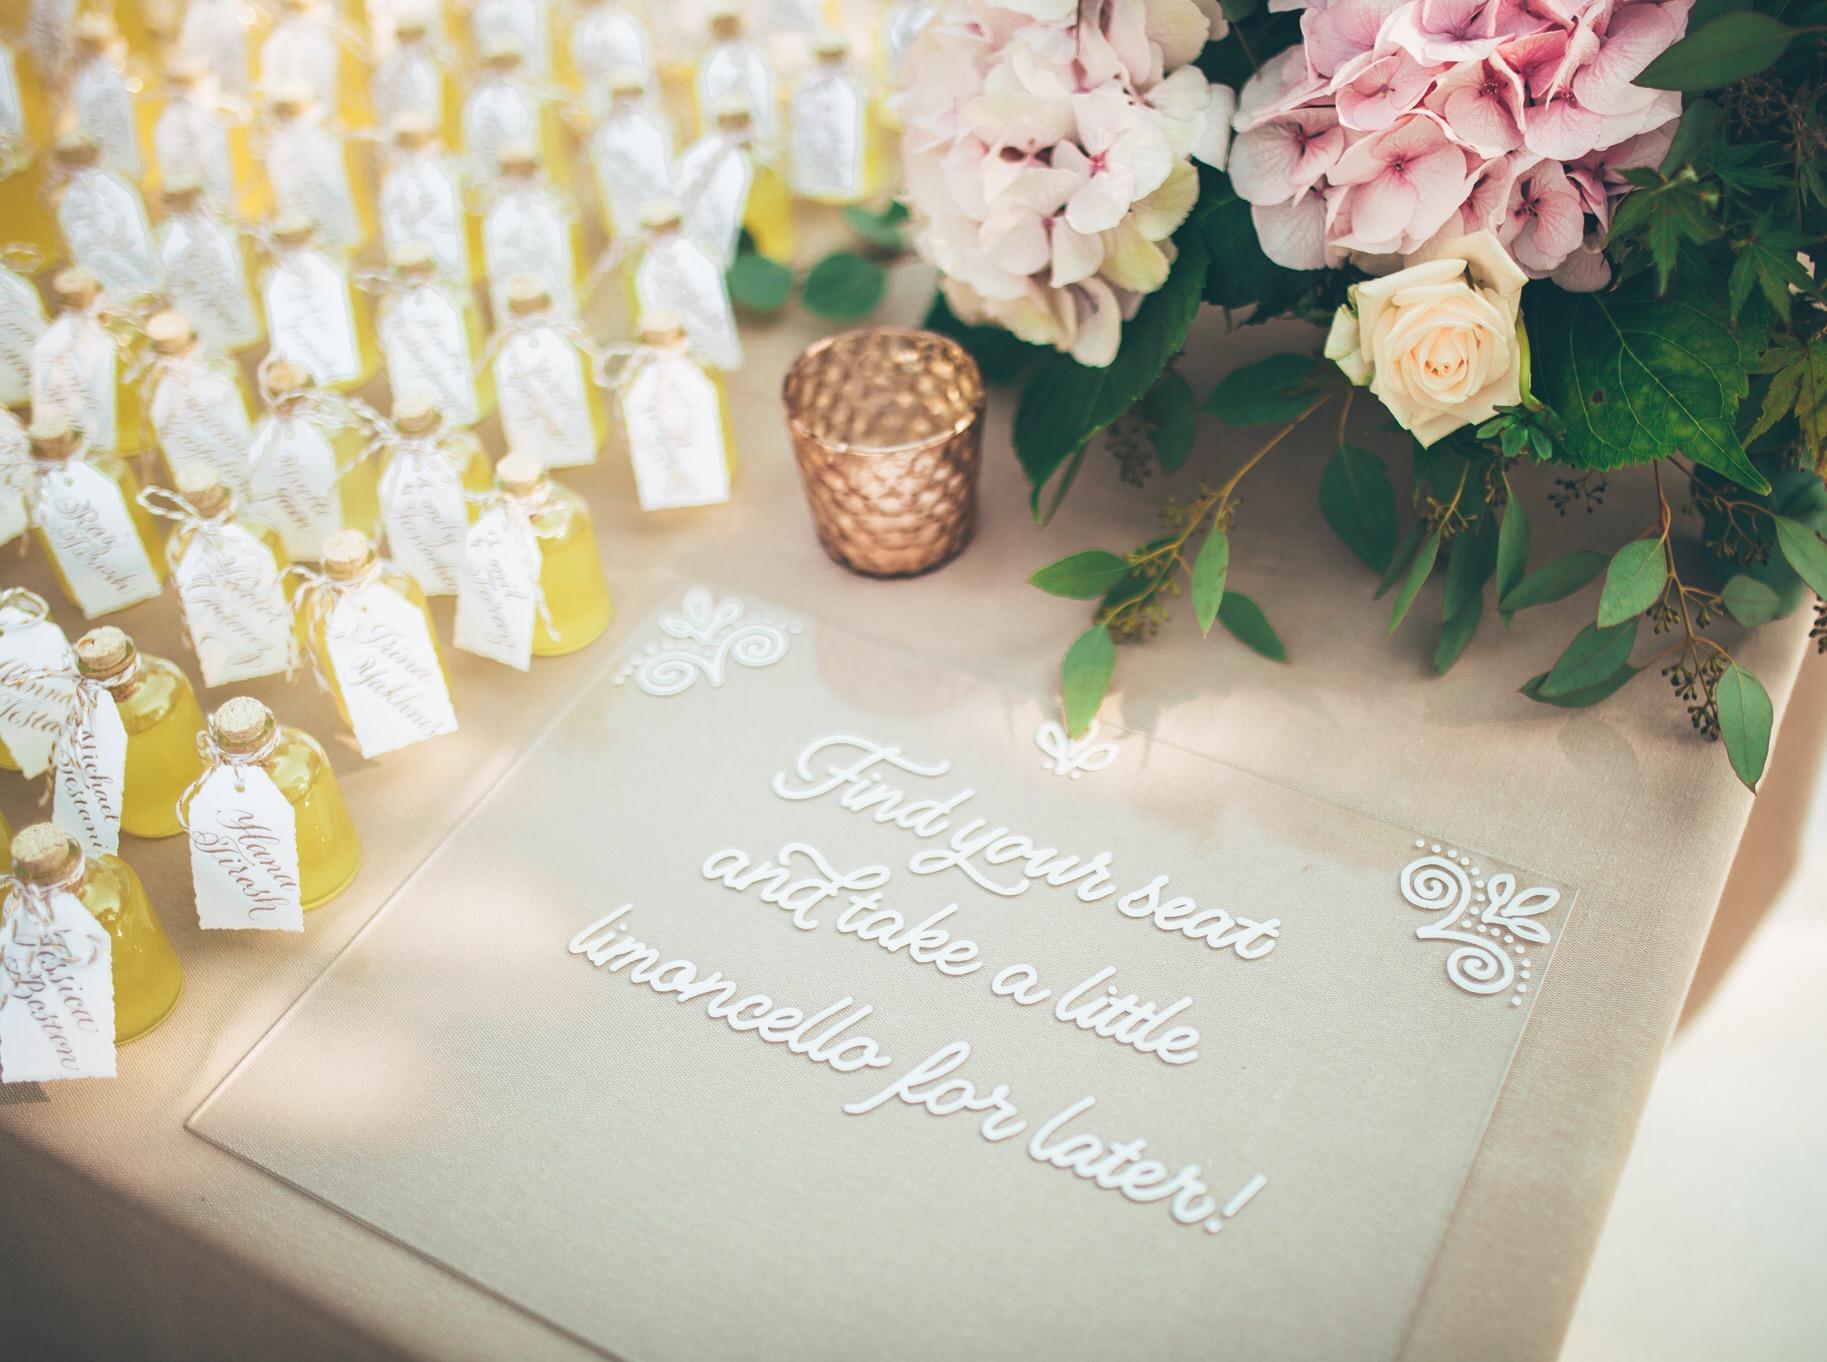 Acrylic wedding signage   by Chavelli www.chavelli.com